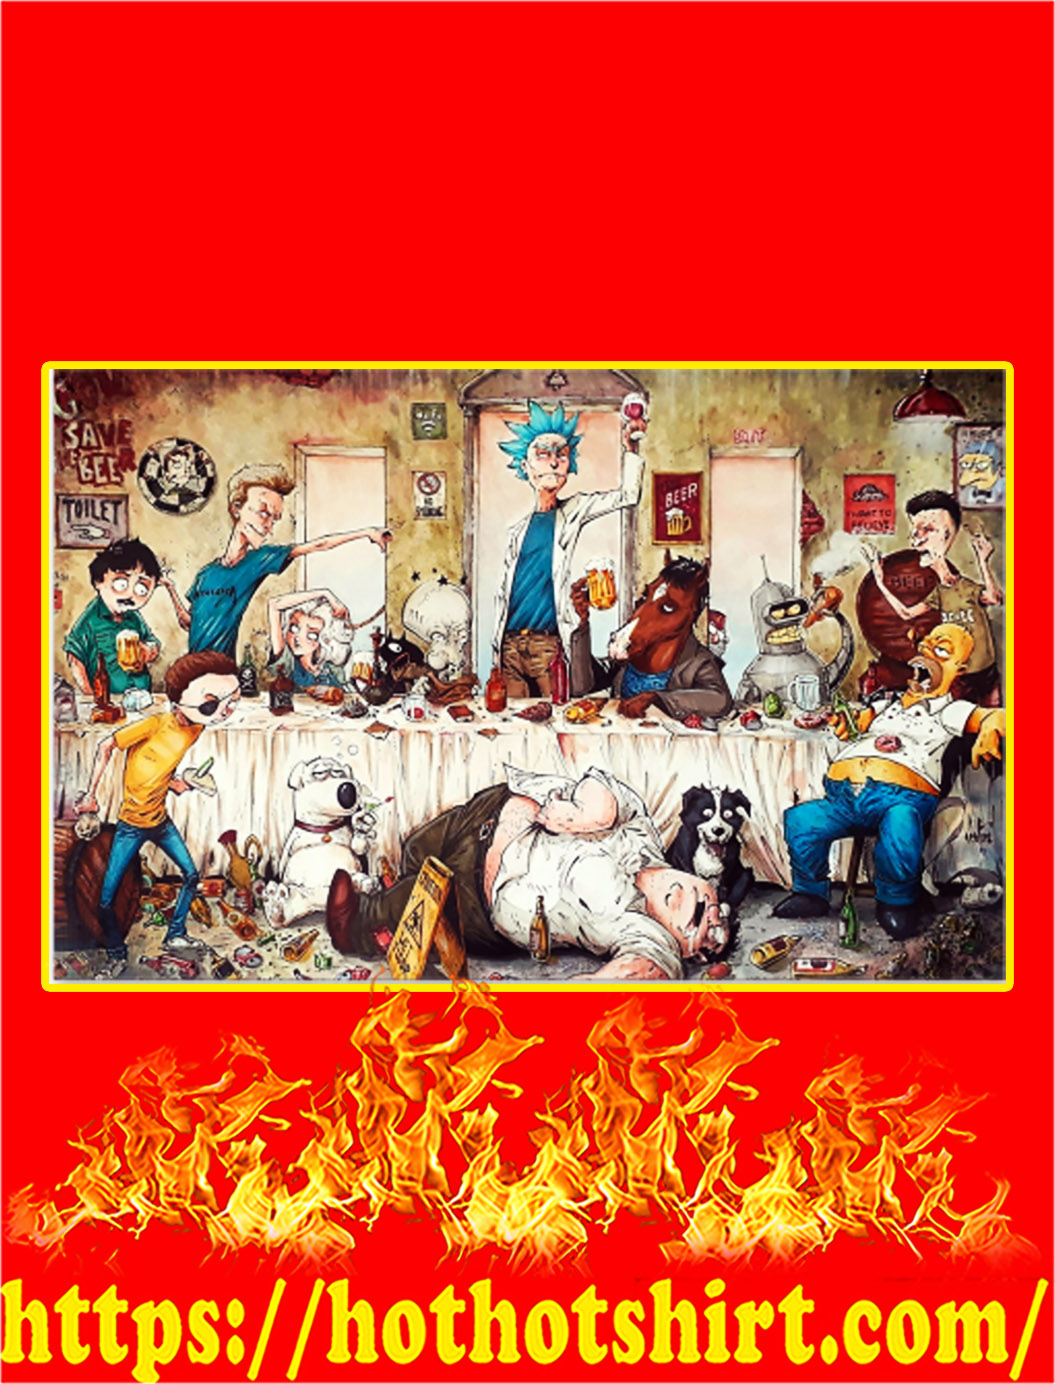 Adult cartoons art work by marcelo ventura poster - A4